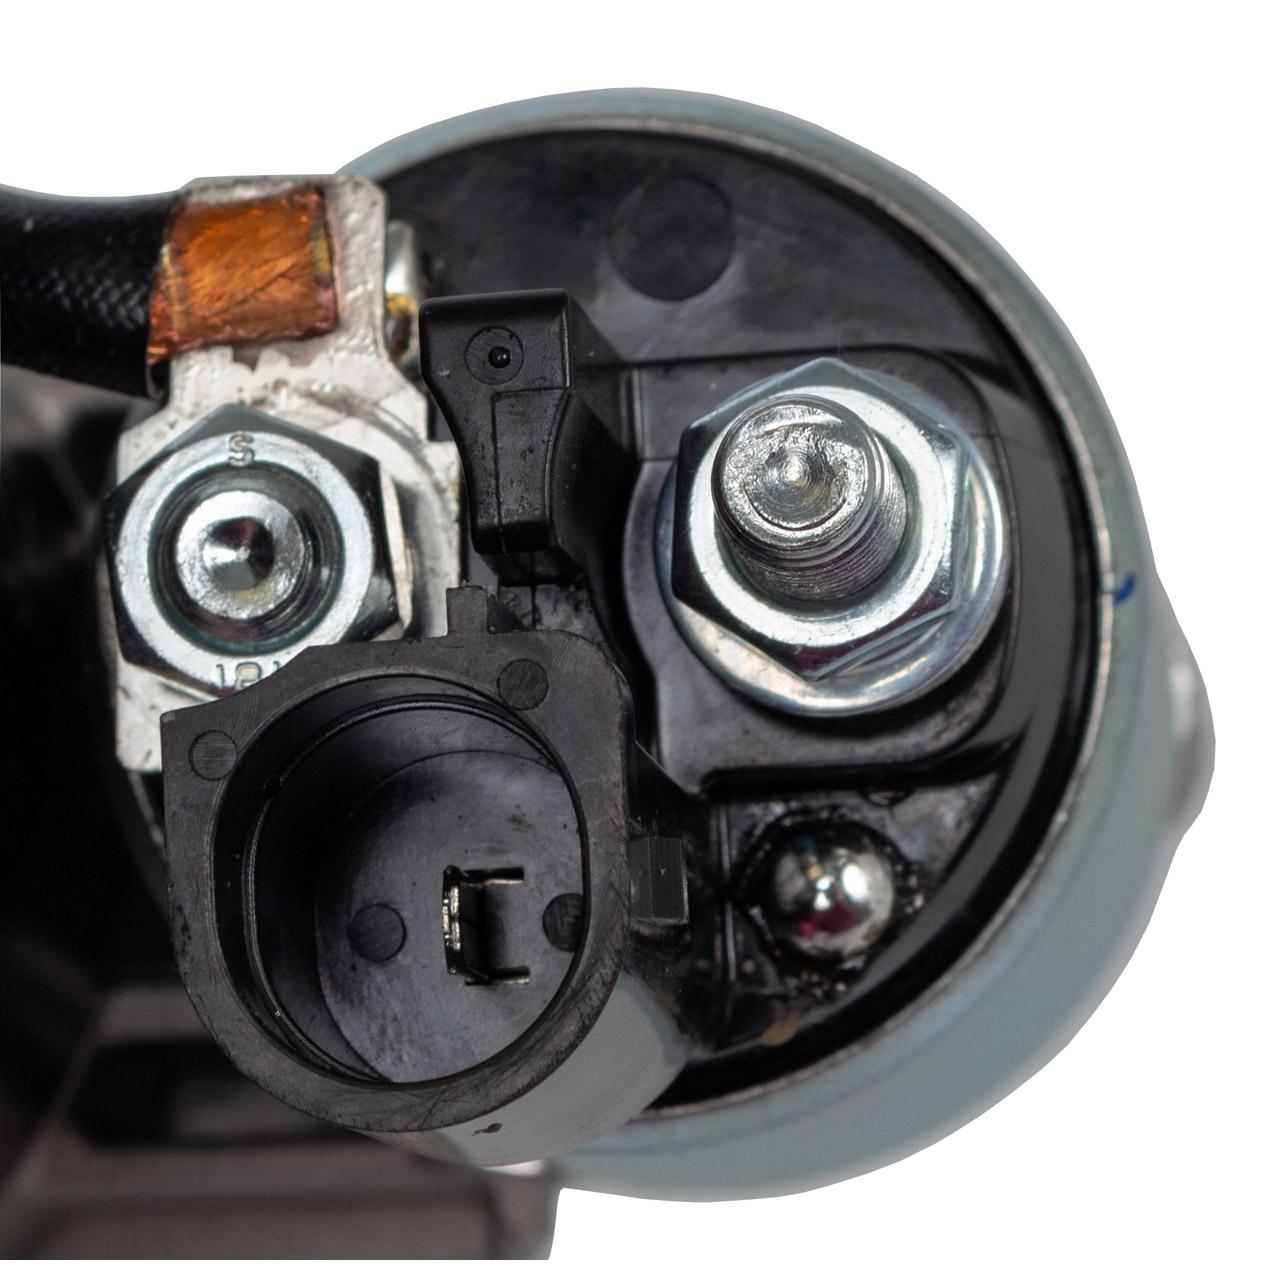 HERTH+BUSS ELPARTS Starter Anlasser 12V 1,7 kW AUDI A3 8P SEAT SKODA VW Golf 5 Caddy 3